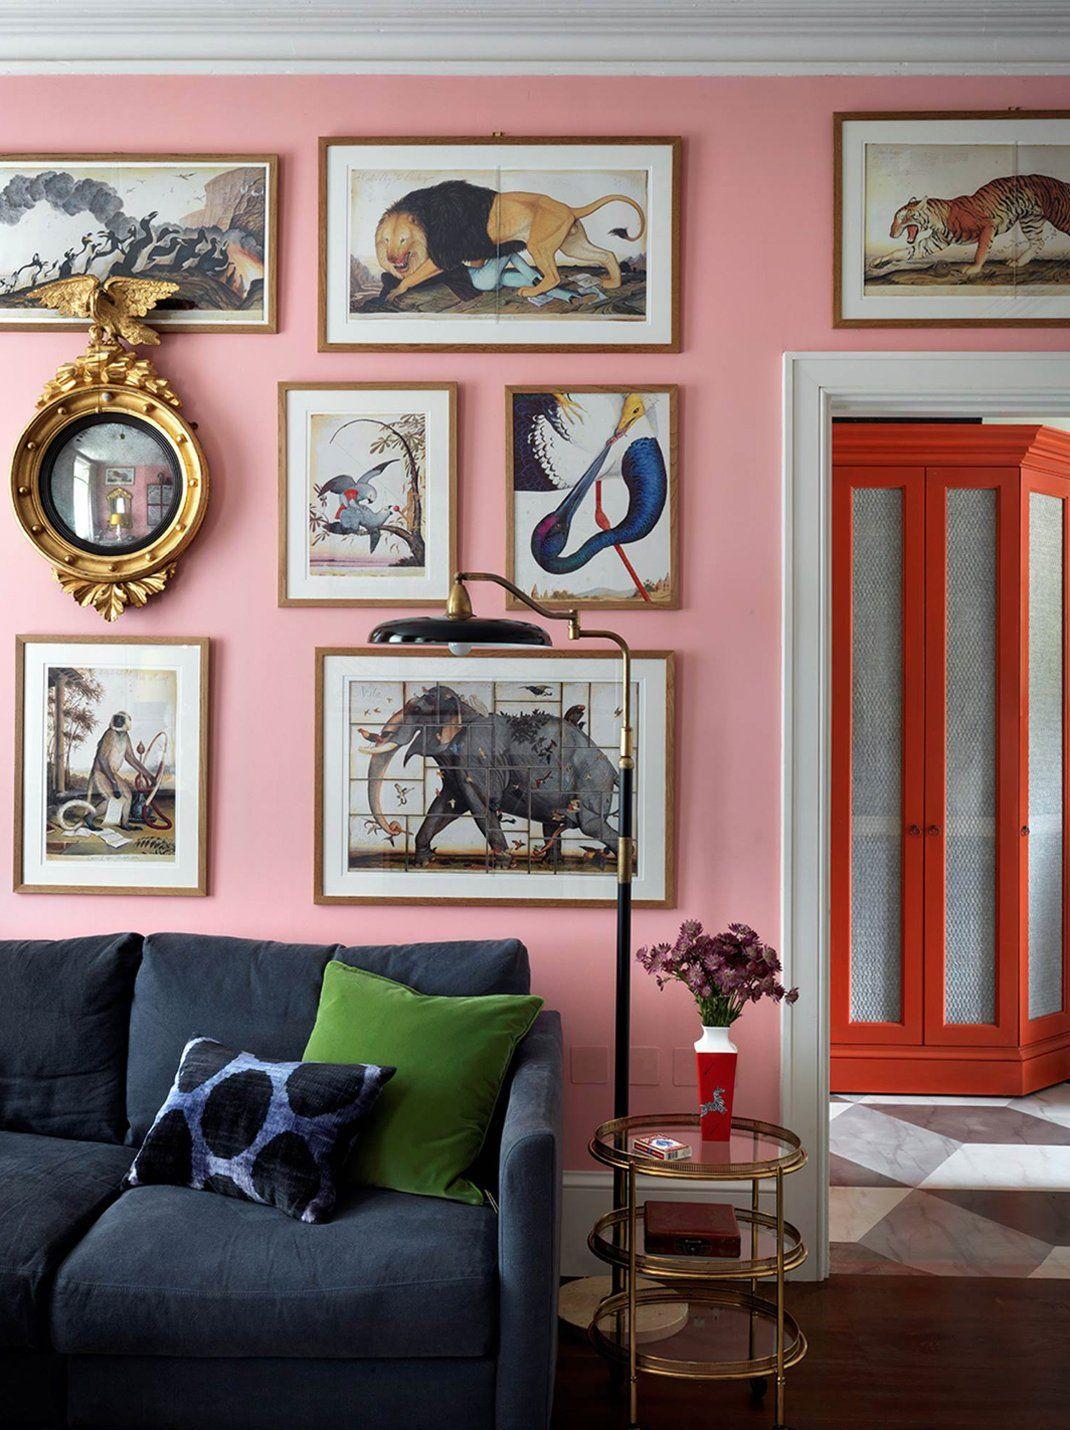 Home interior wall design inspirational interiors by beata heuman  home sweet home interiors